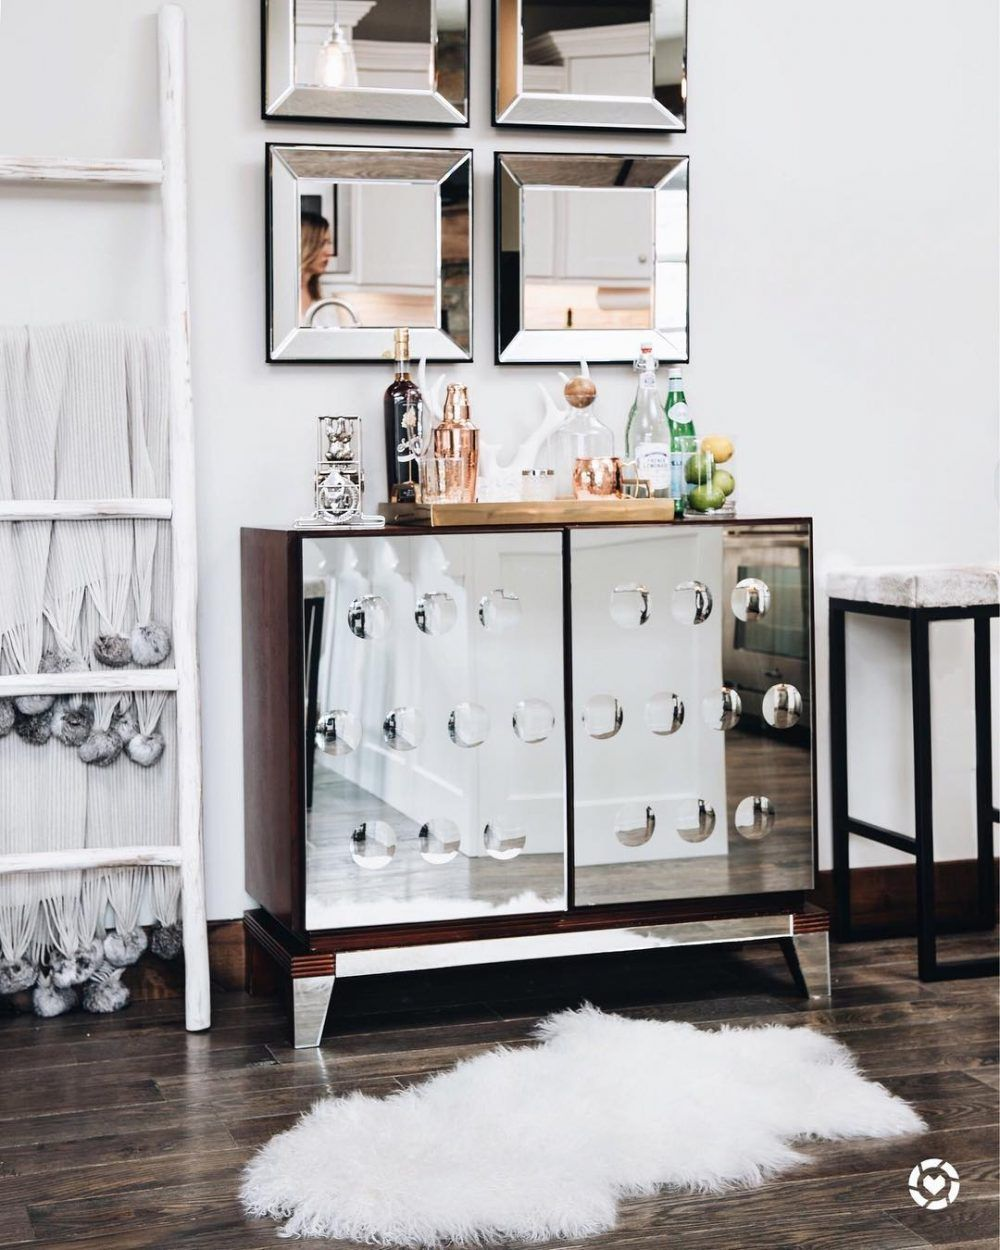 Homestyle Accessoires: #homedecor#homesweethome #design #decor#decorinspo